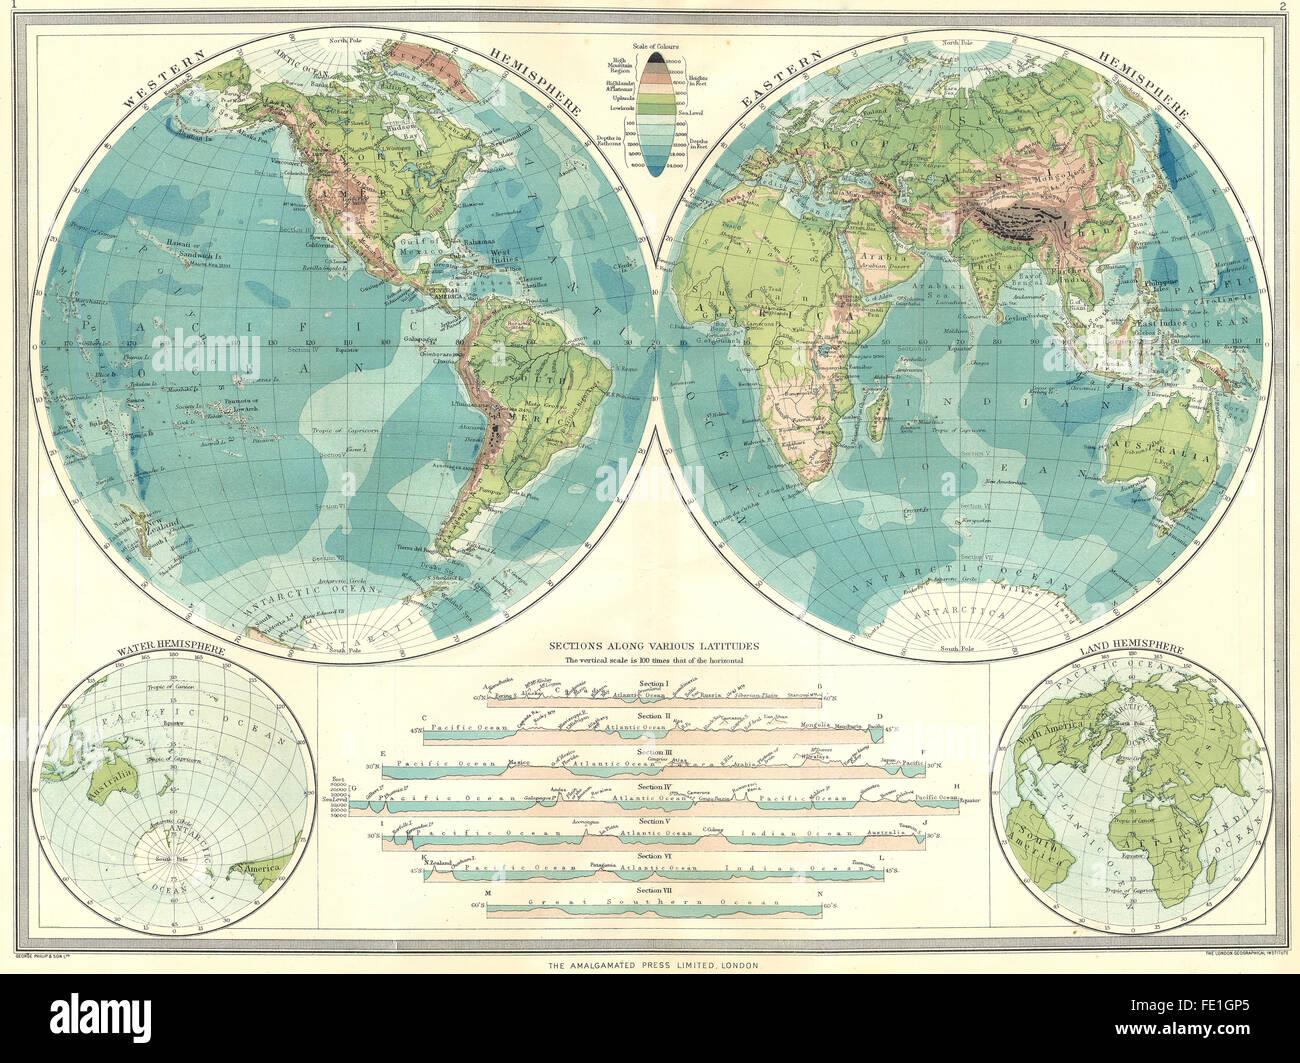 Eastern hemisphere map stock photos eastern hemisphere map stock world hemispheres physical western hemisphere eastern water land 1907 map gumiabroncs Choice Image